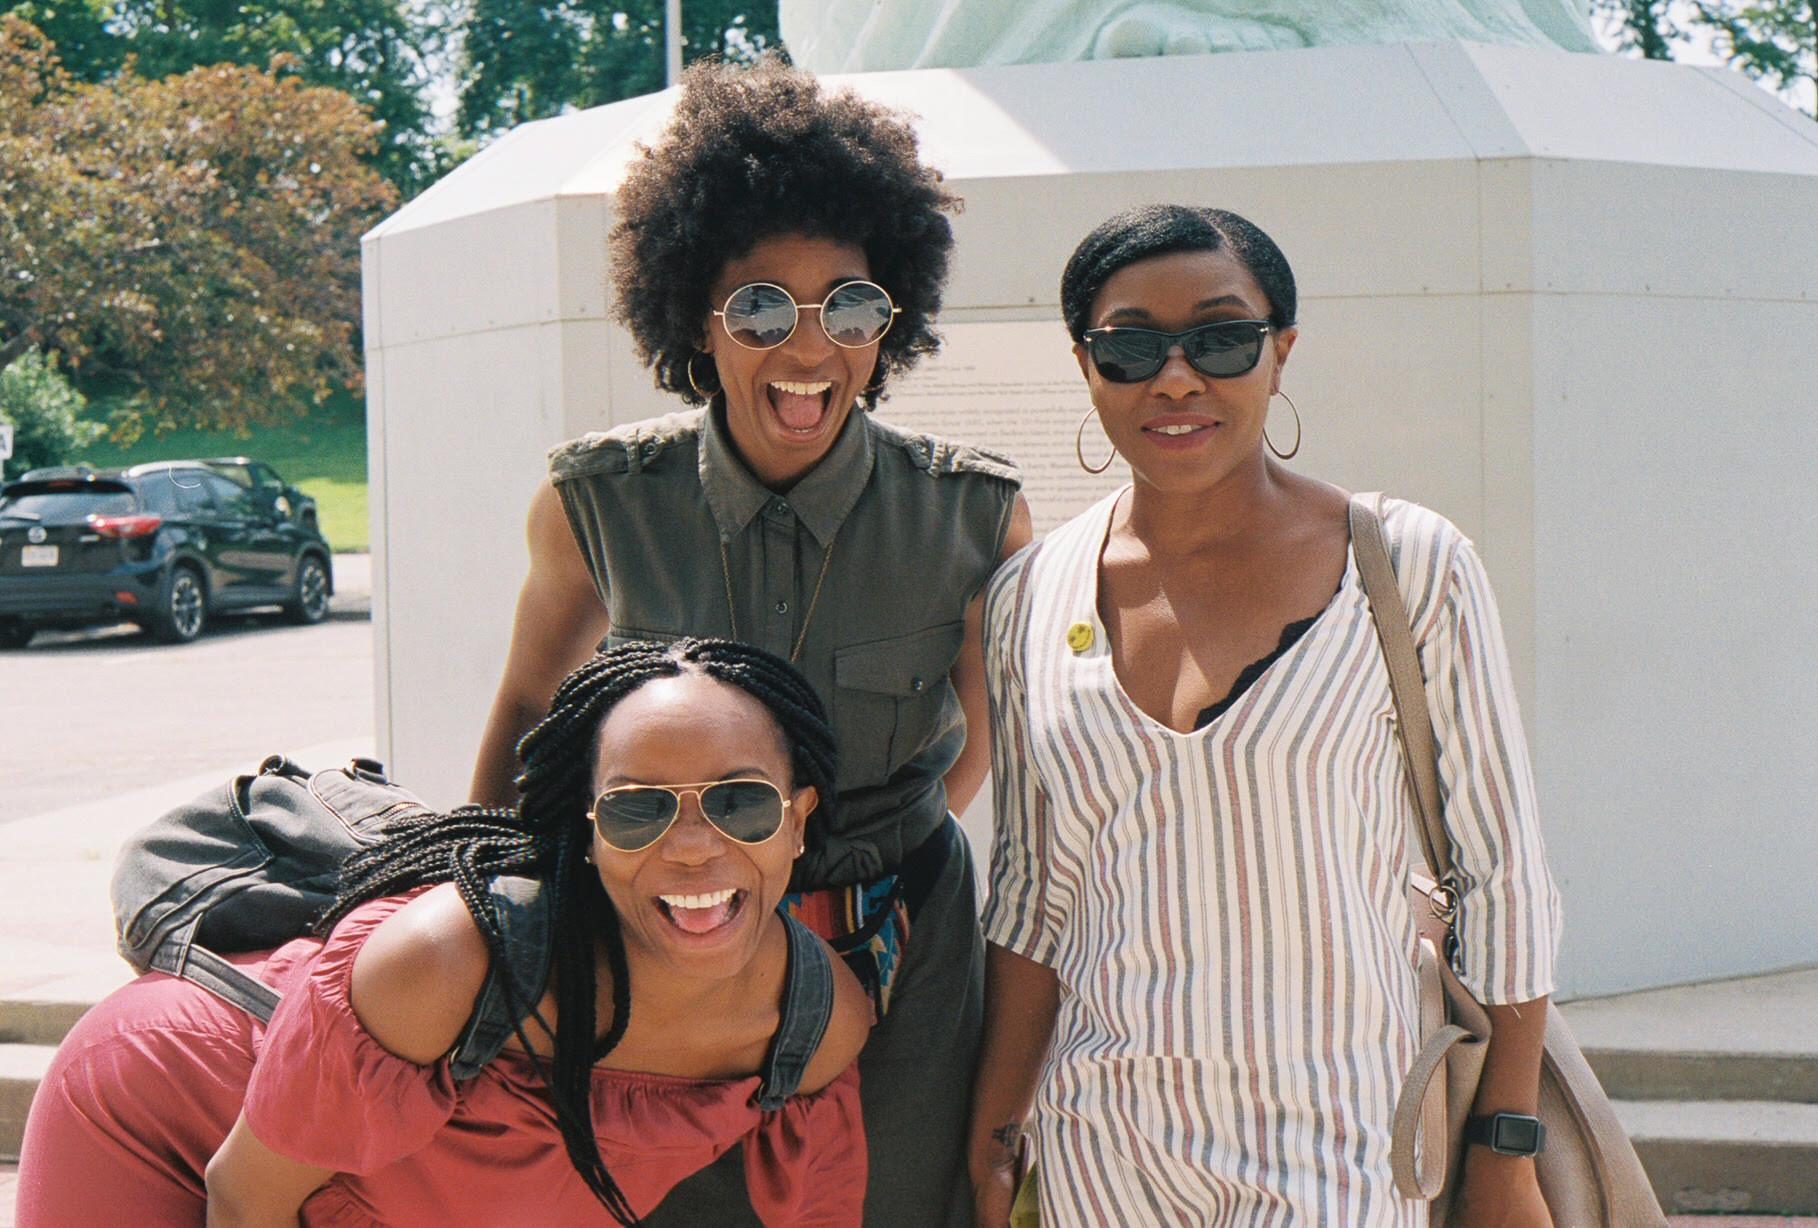 Kali Wilder, Safon Floyd, and Sirita Wright